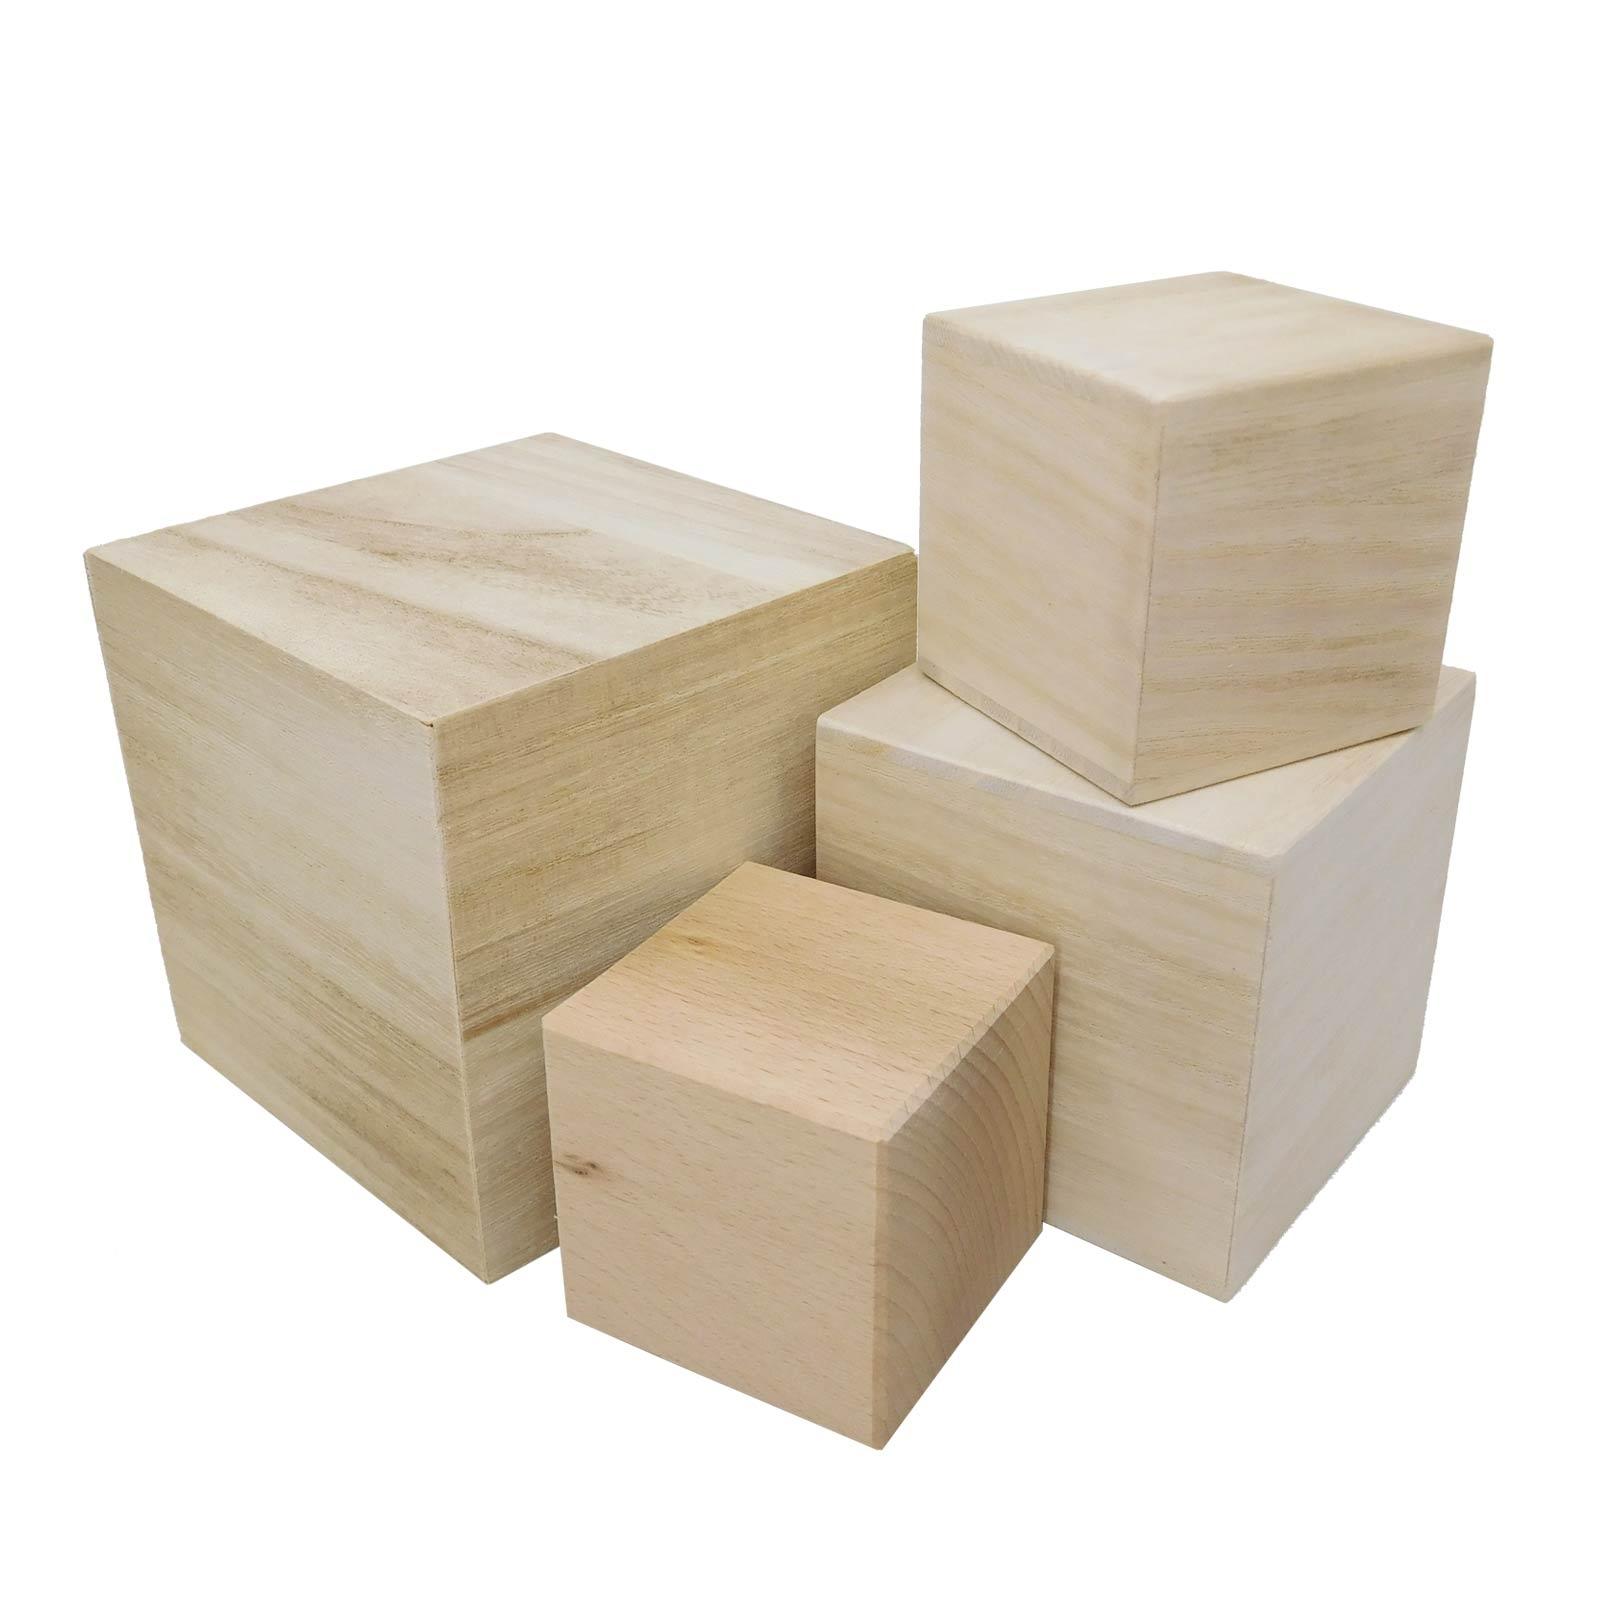 Plain Wooden Blanks, Cubes, Building Blocks